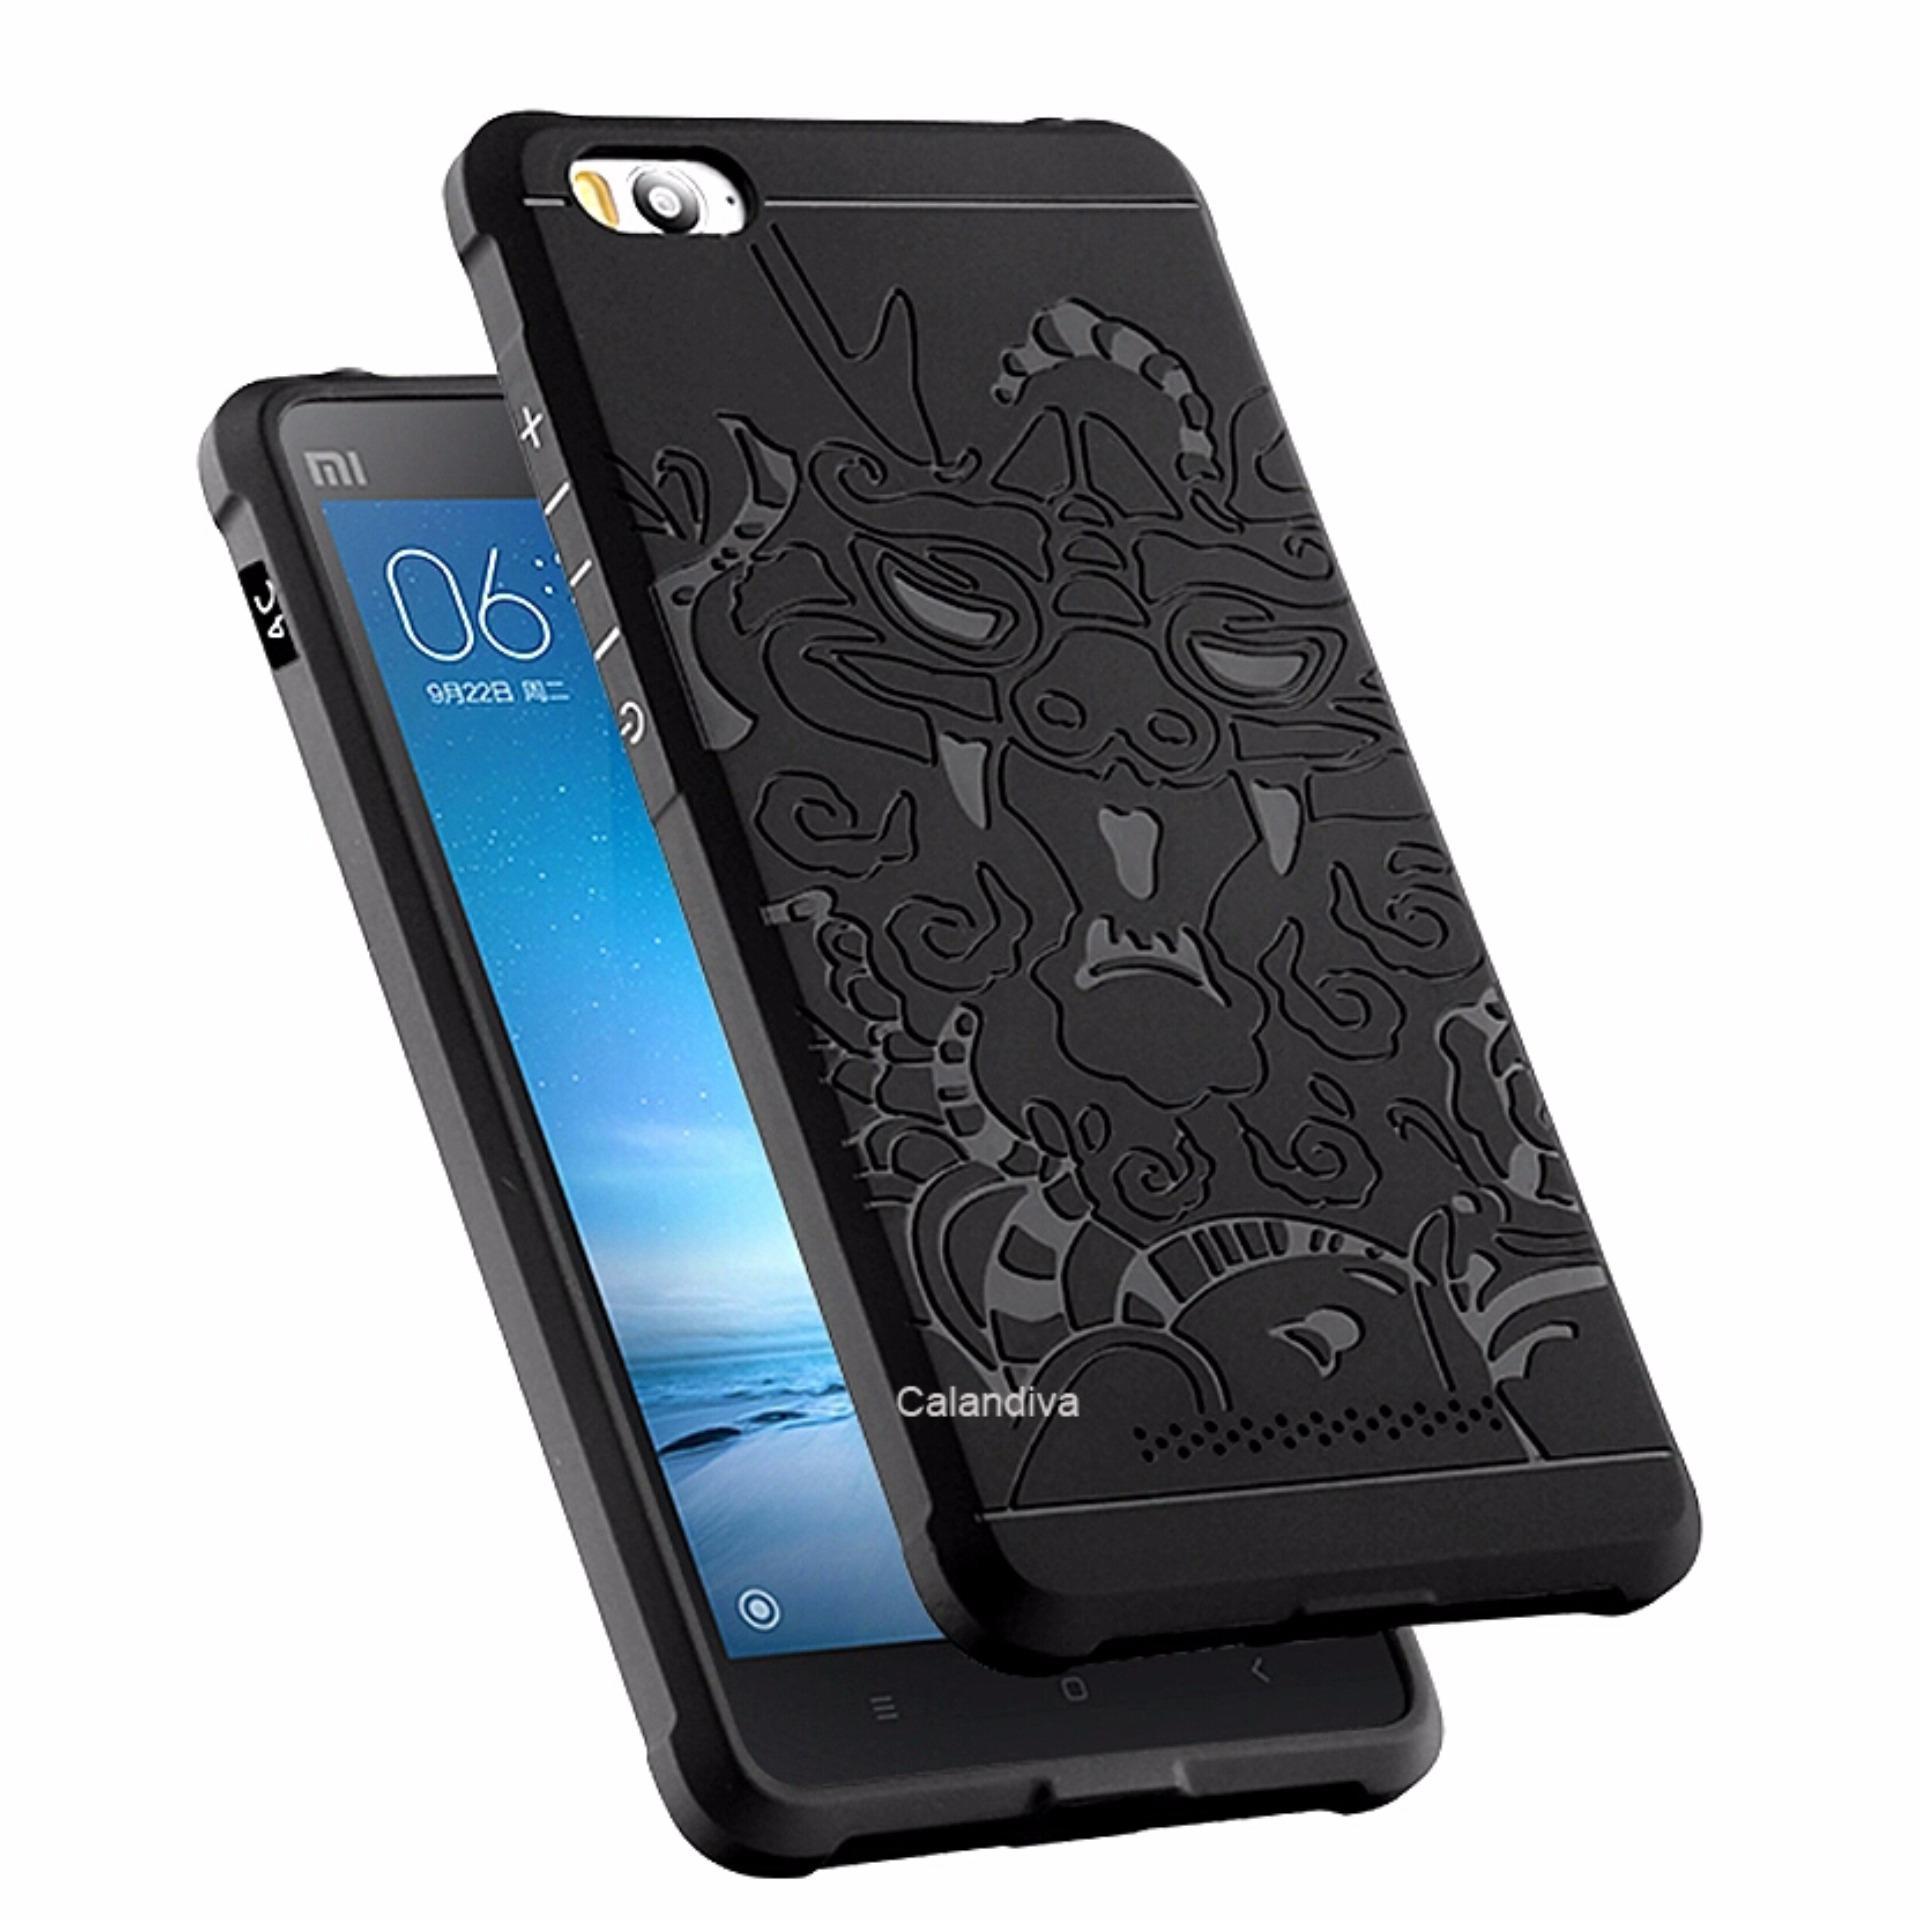 ... Calandiva Dragon Shockproof Hybrid Case for Xiaomi MI4i / MI4c - Hitam + Gratis Rounded Tempered ...